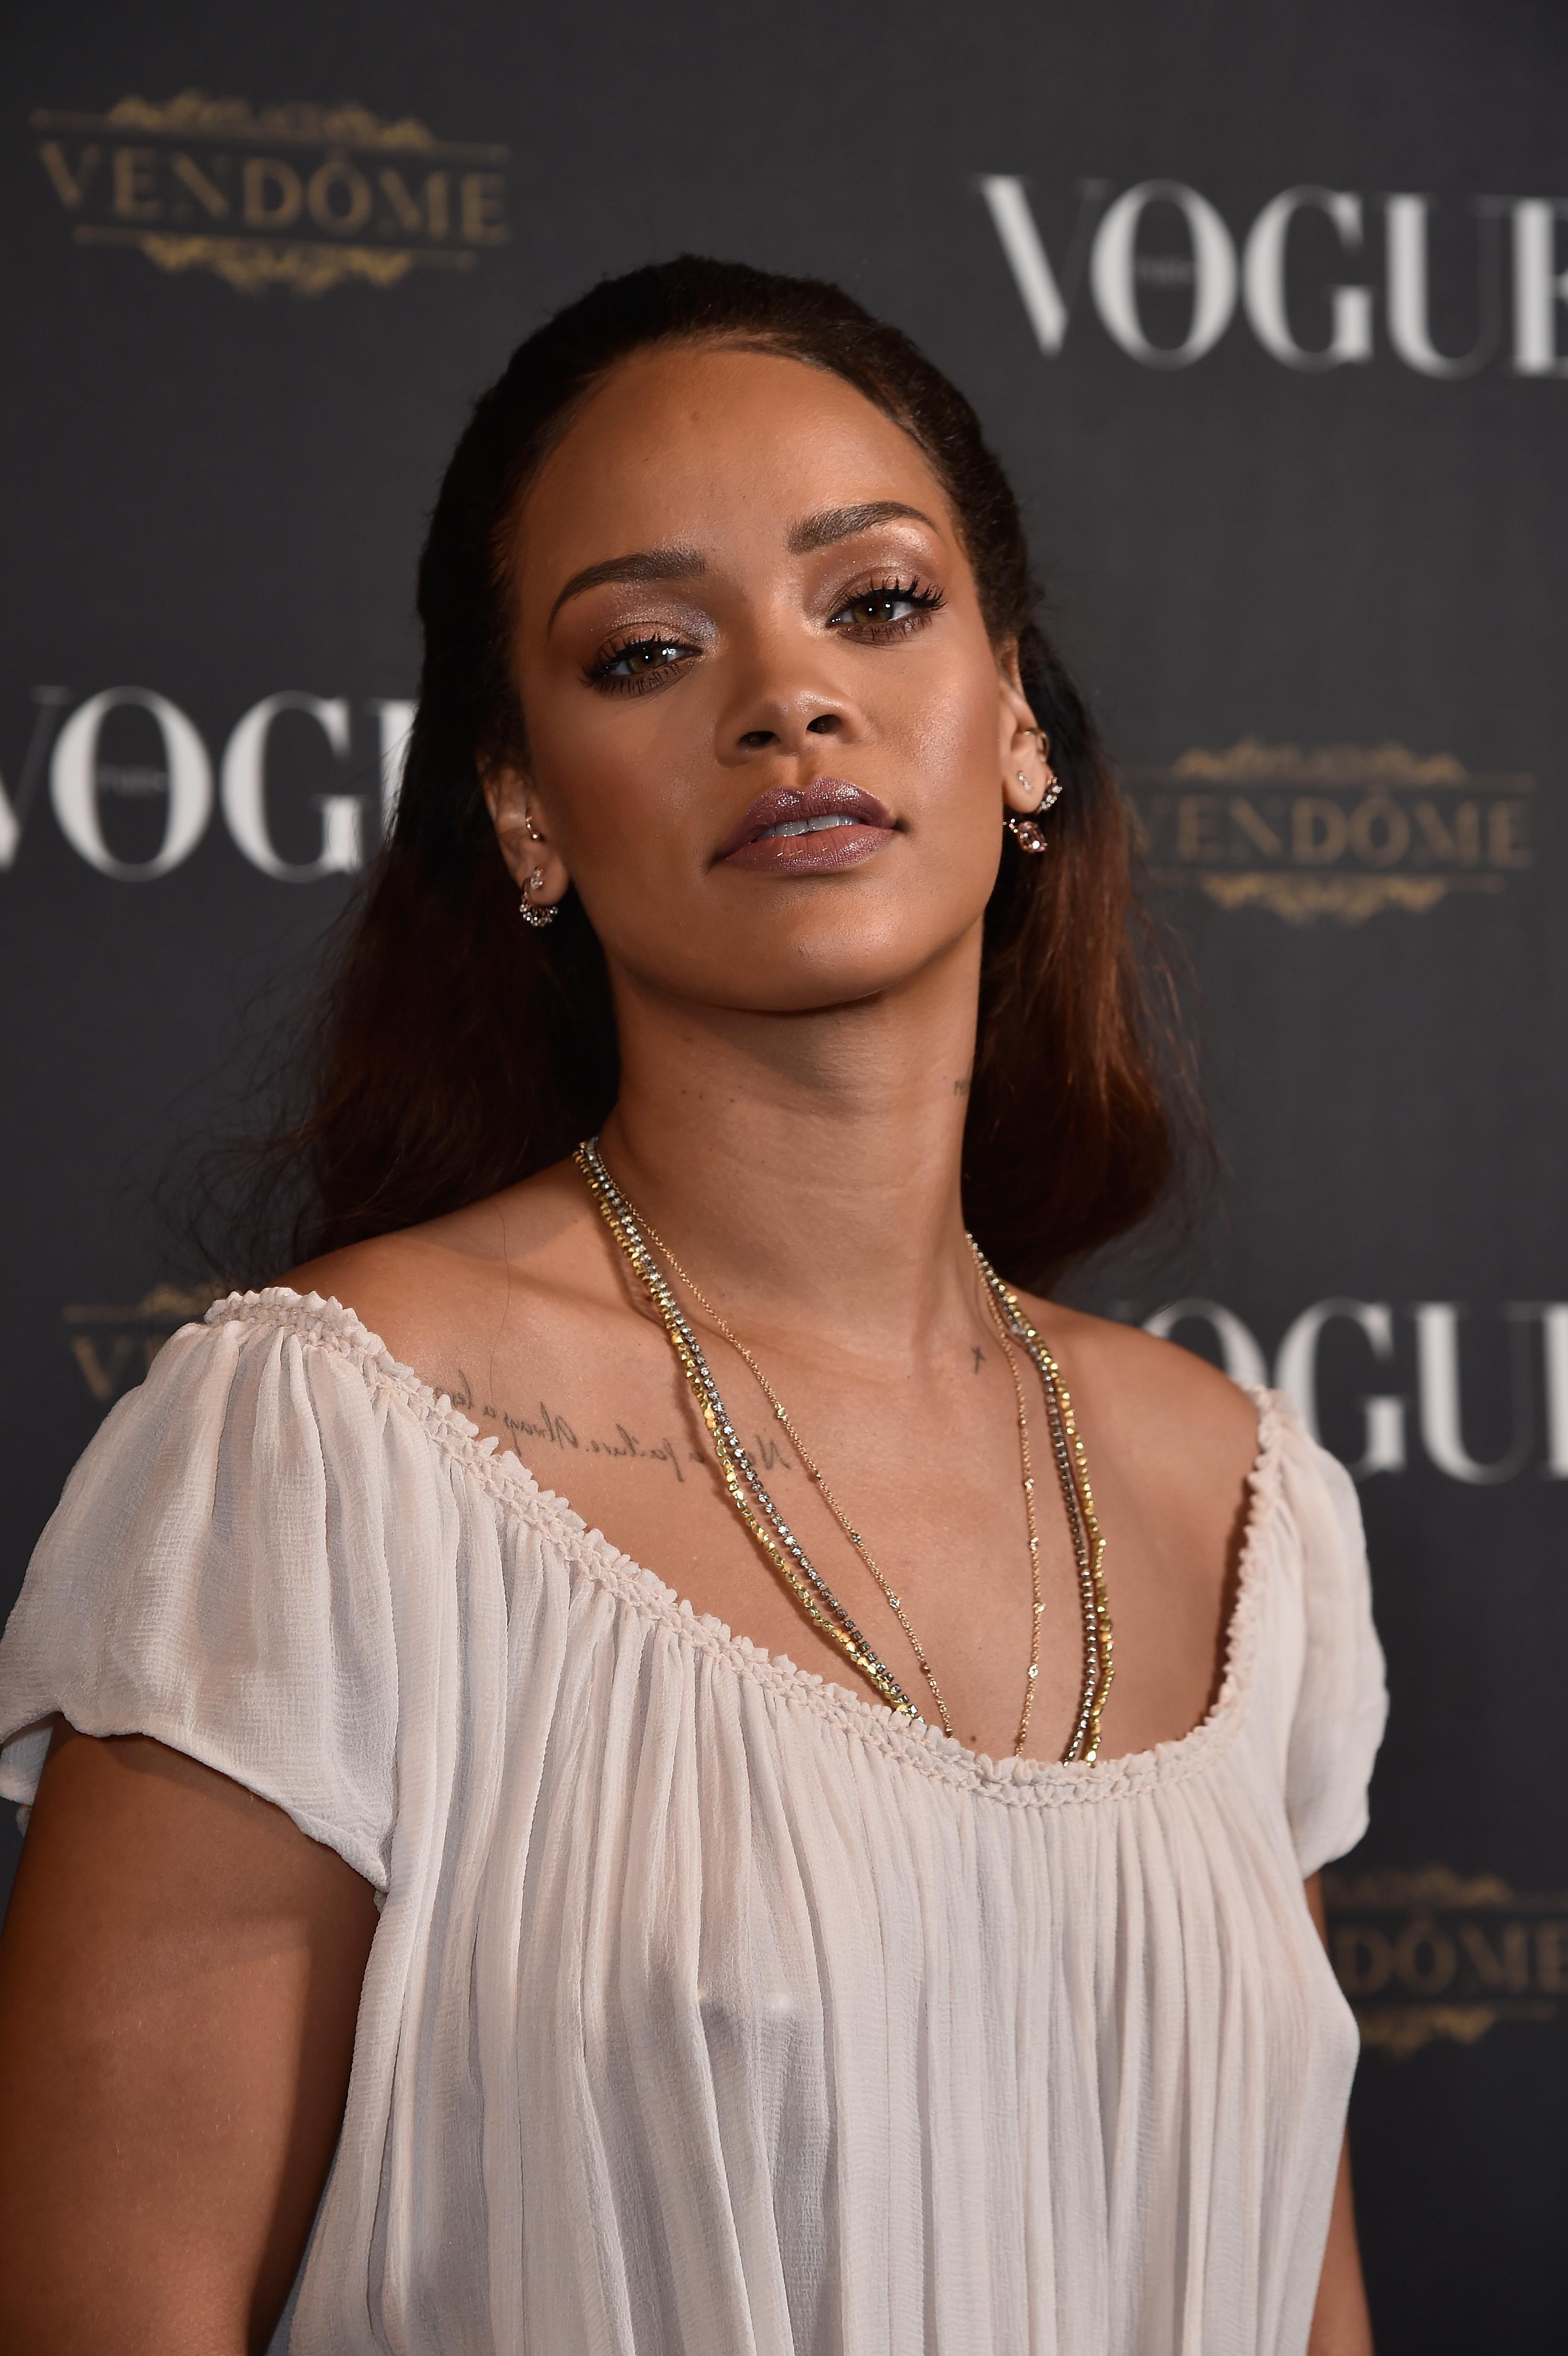 Rihanna See-Through paparazzi photos | The Fappening - News